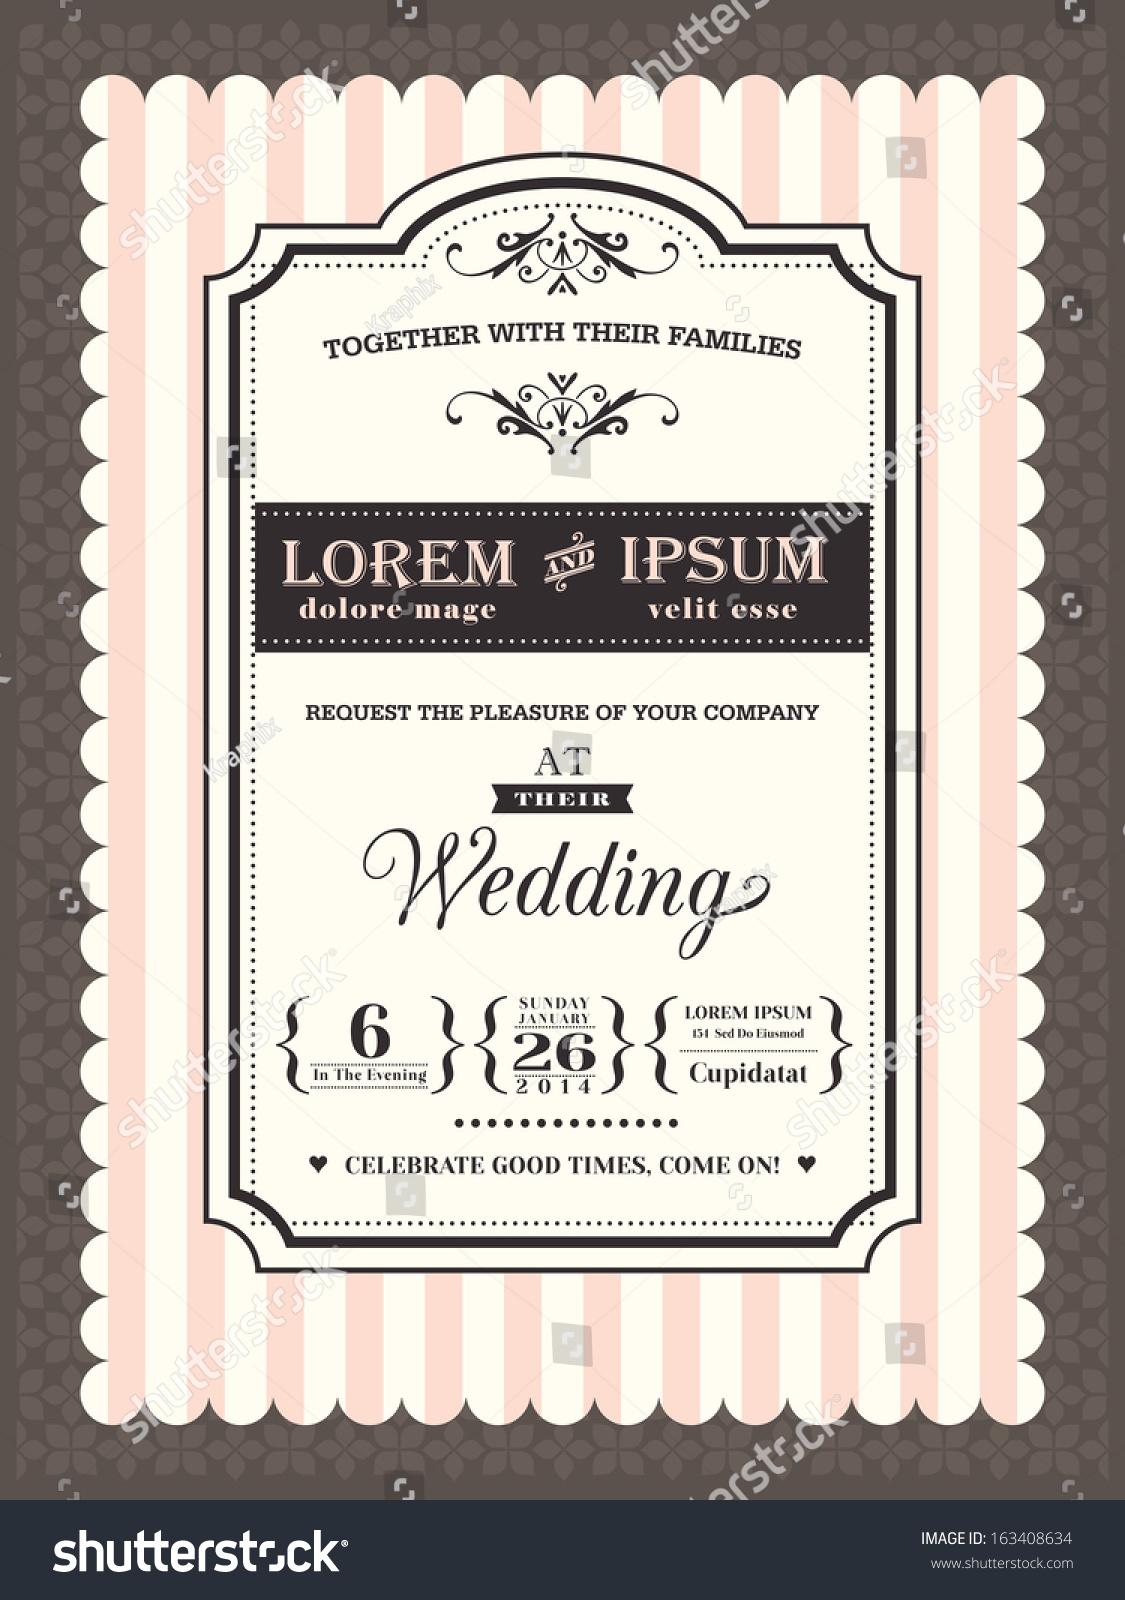 stock vector vintage wedding invitation border and frame template wedding invitation frame Vintage Wedding invitation border and frame template